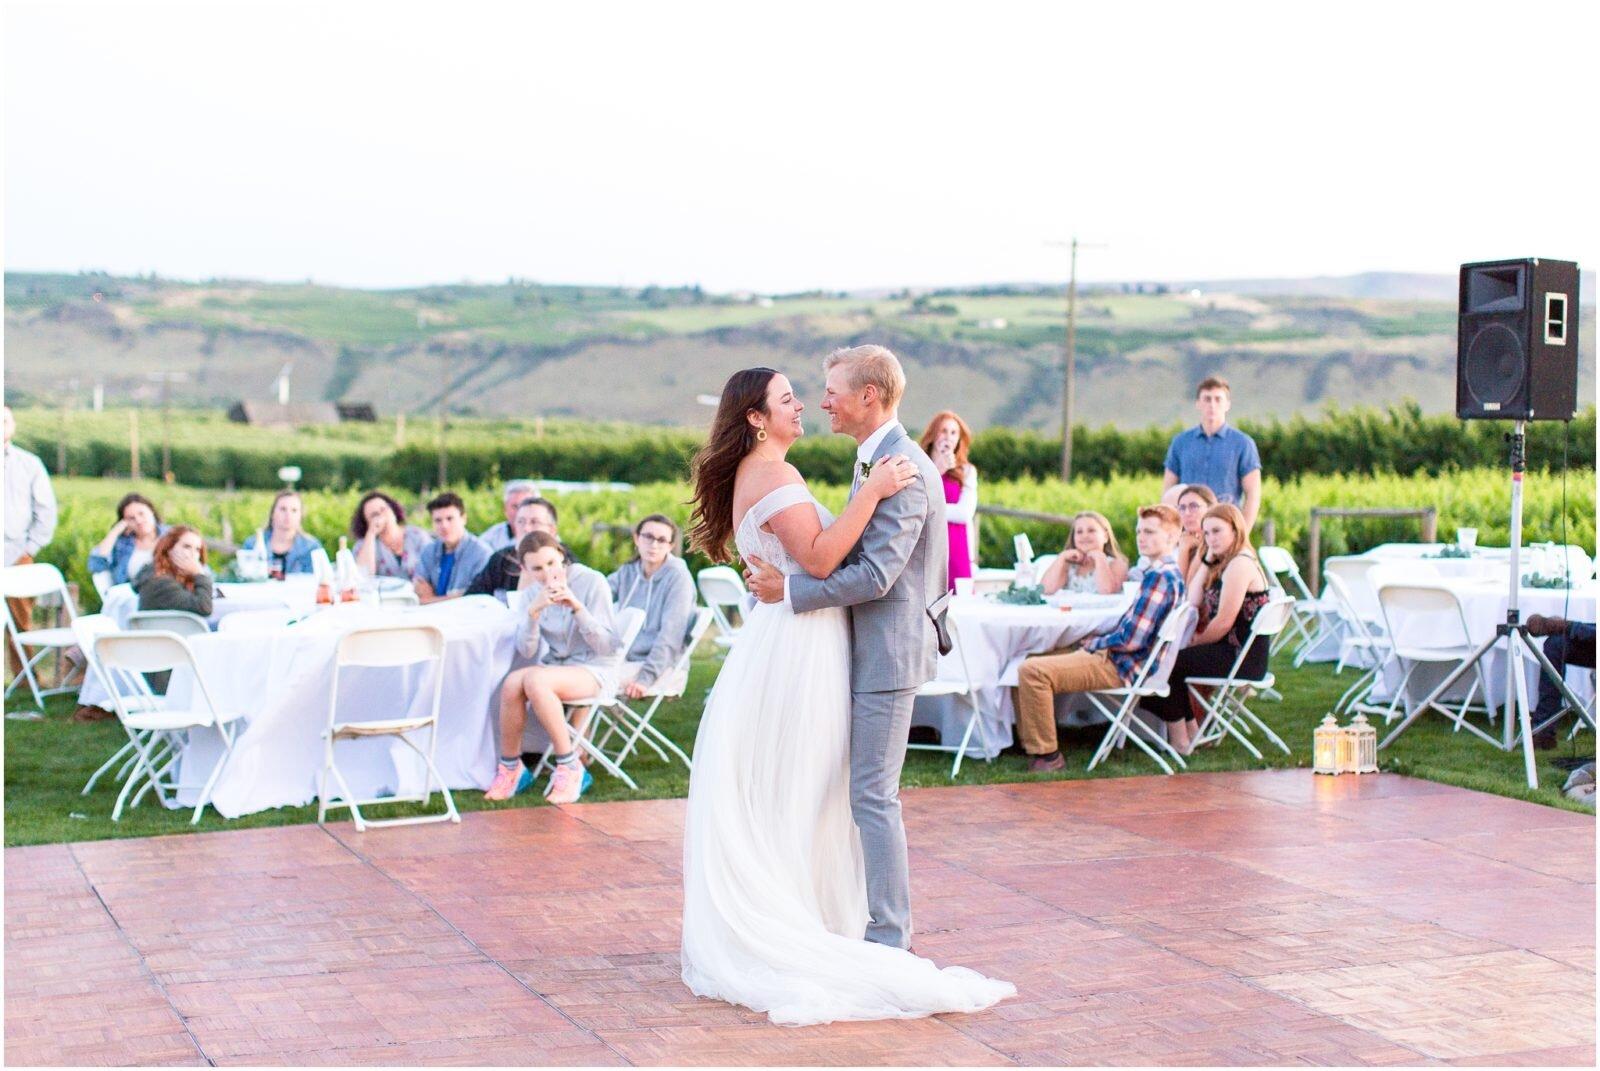 Fontaine-Estates-Winery-Wedding-Spokane-Wedding-Photographer-Taylor-Rose-Photography_0090-1600x1071.jpg